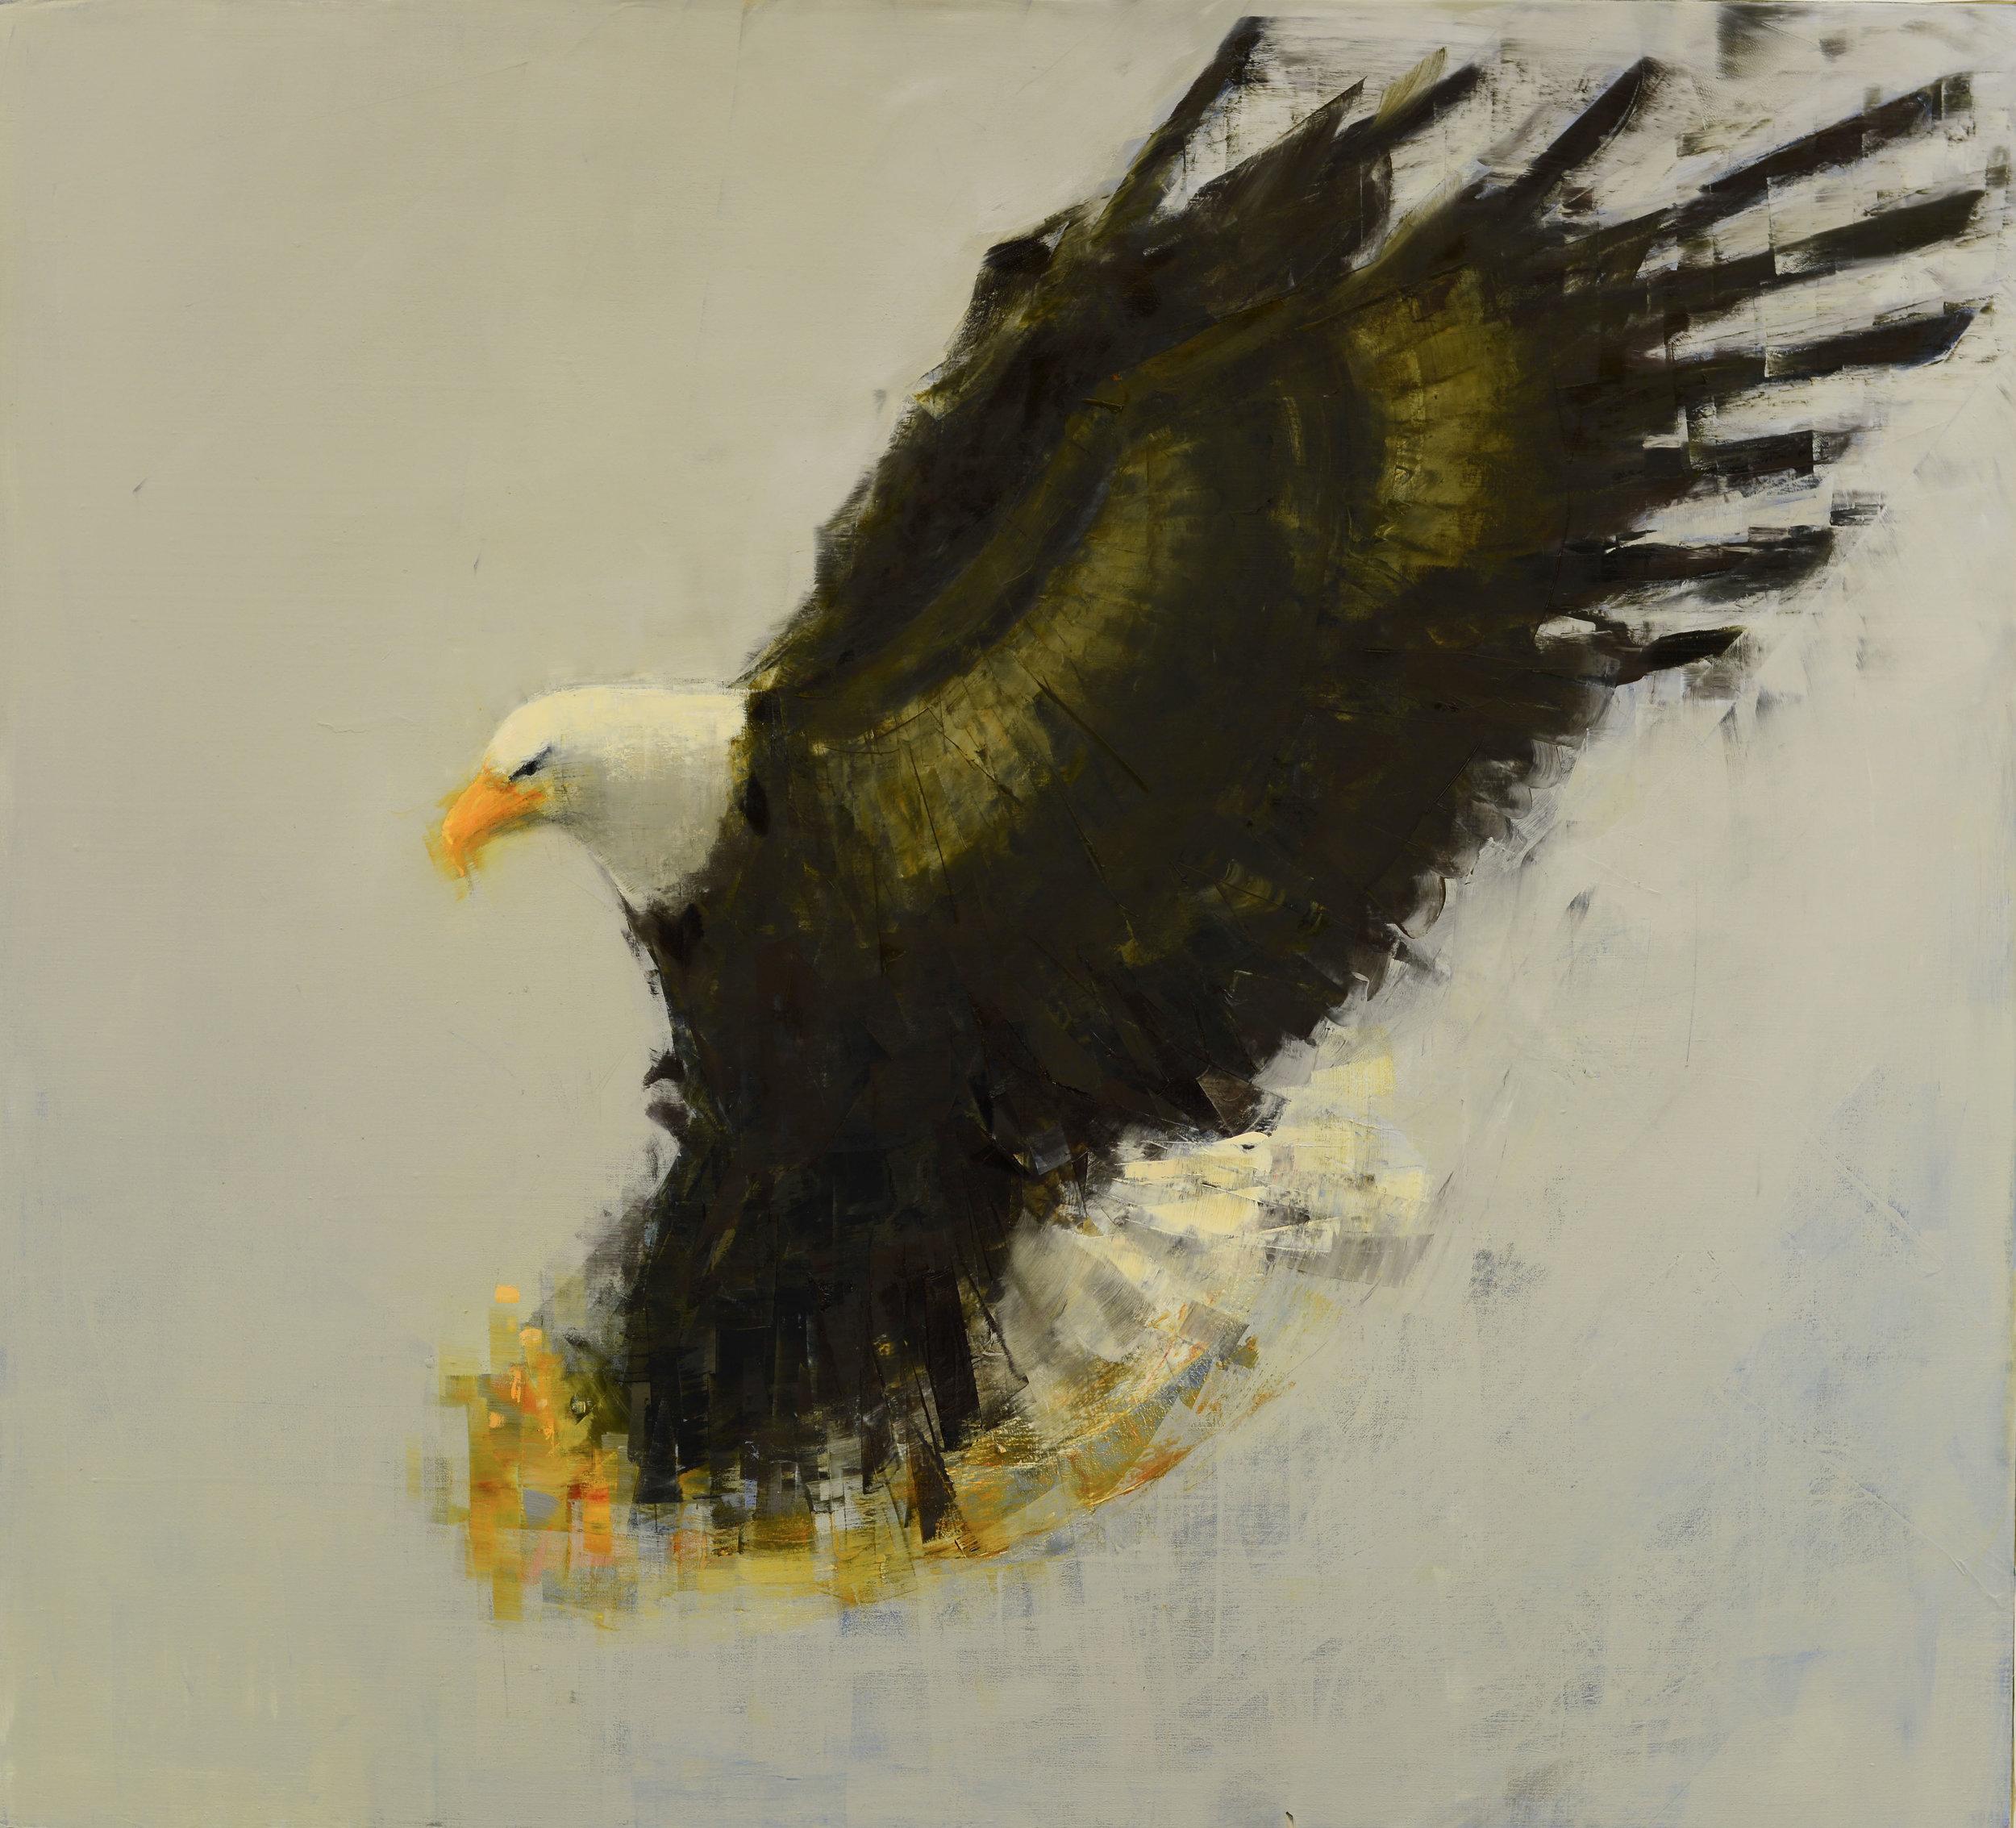 Bald+Eagle+(Hunting)_58x64.jpg